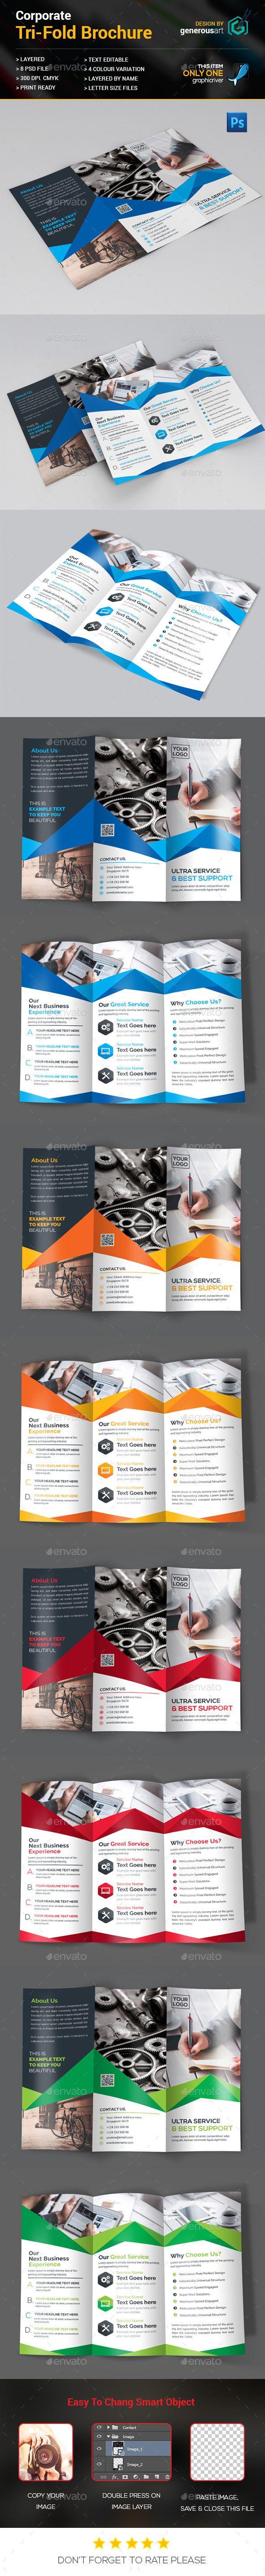 Tri-Fold Brochure Template PSD. Download here: http://graphicriver.net/item/trifold-brochure/15321059?ref=ksioks